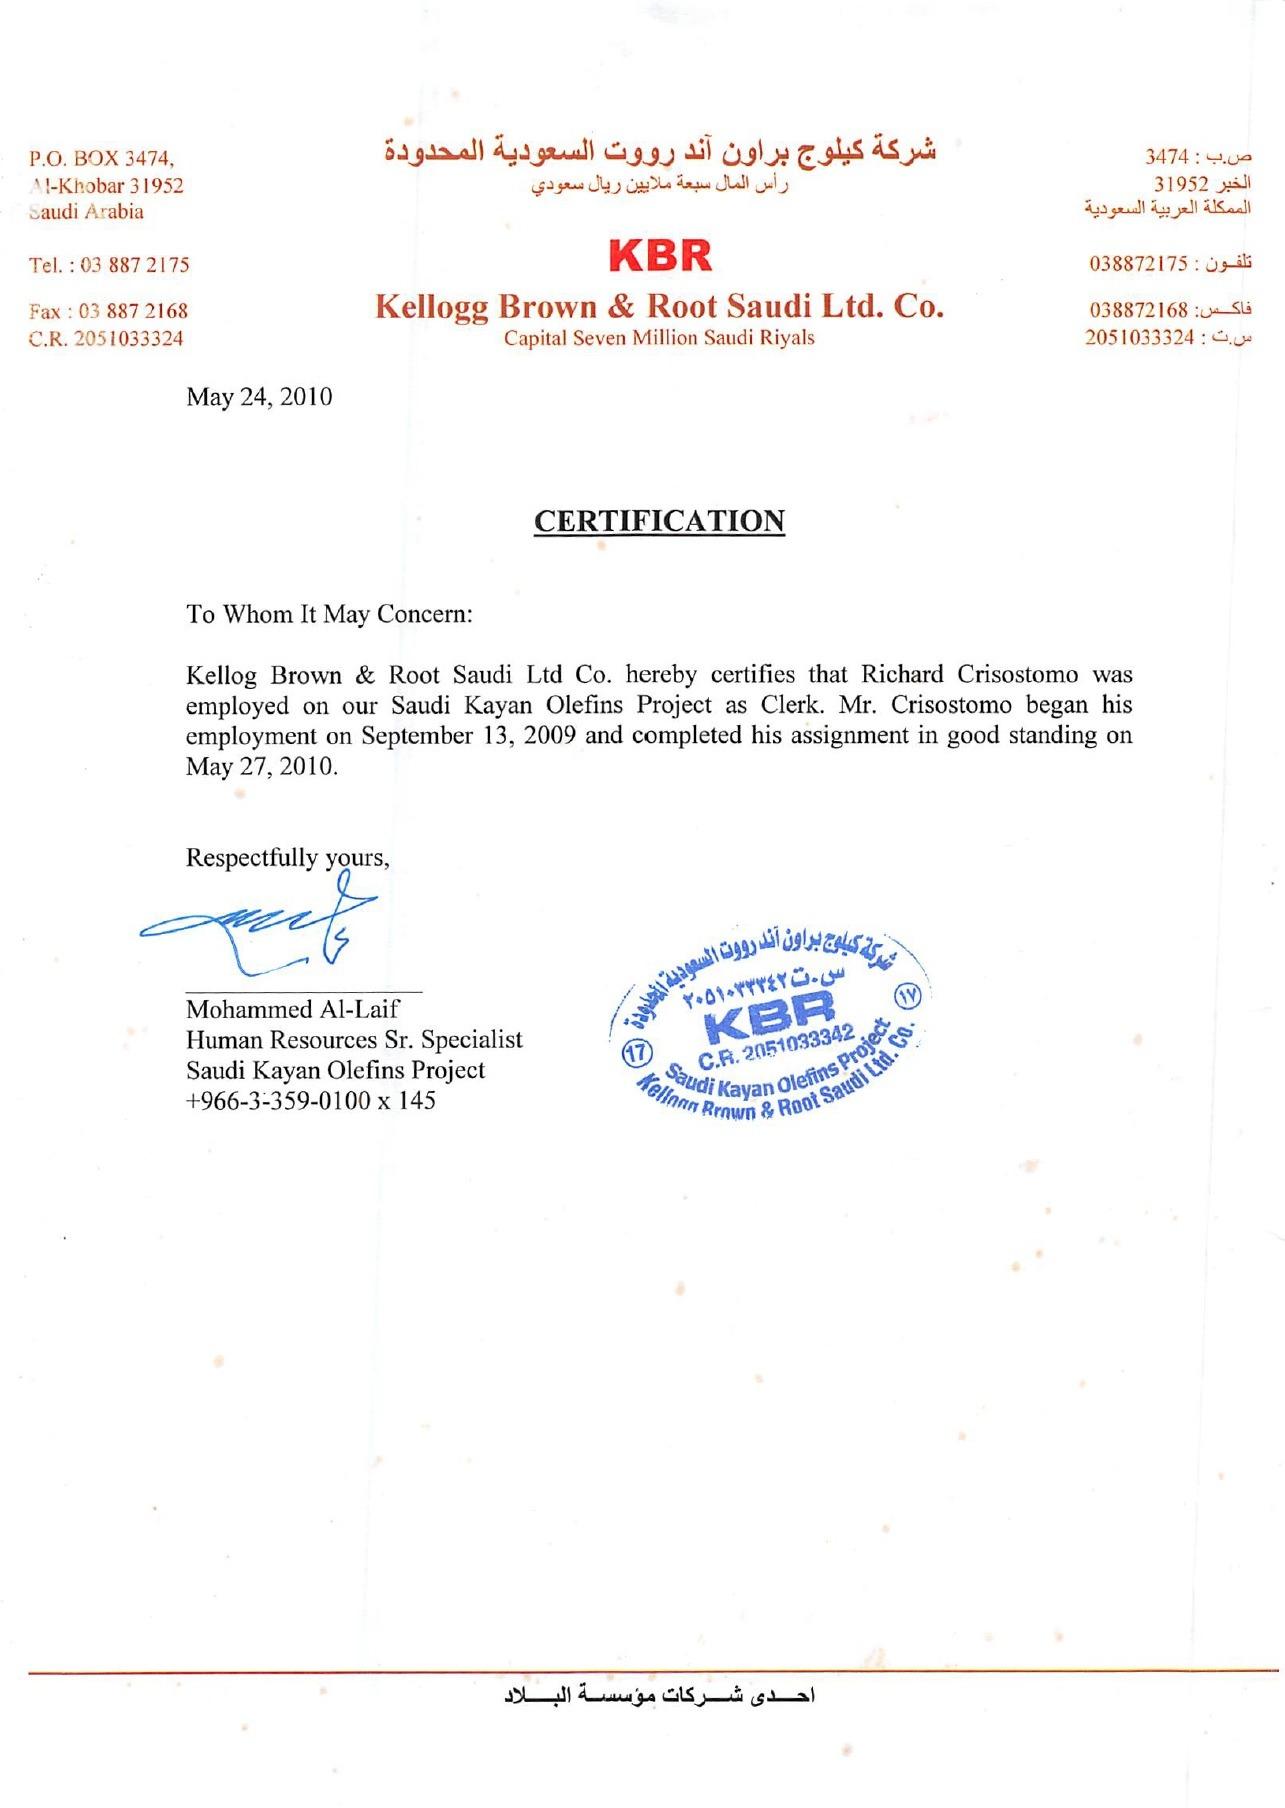 Certificate Of Employment Sample In Saudi Arabia Images